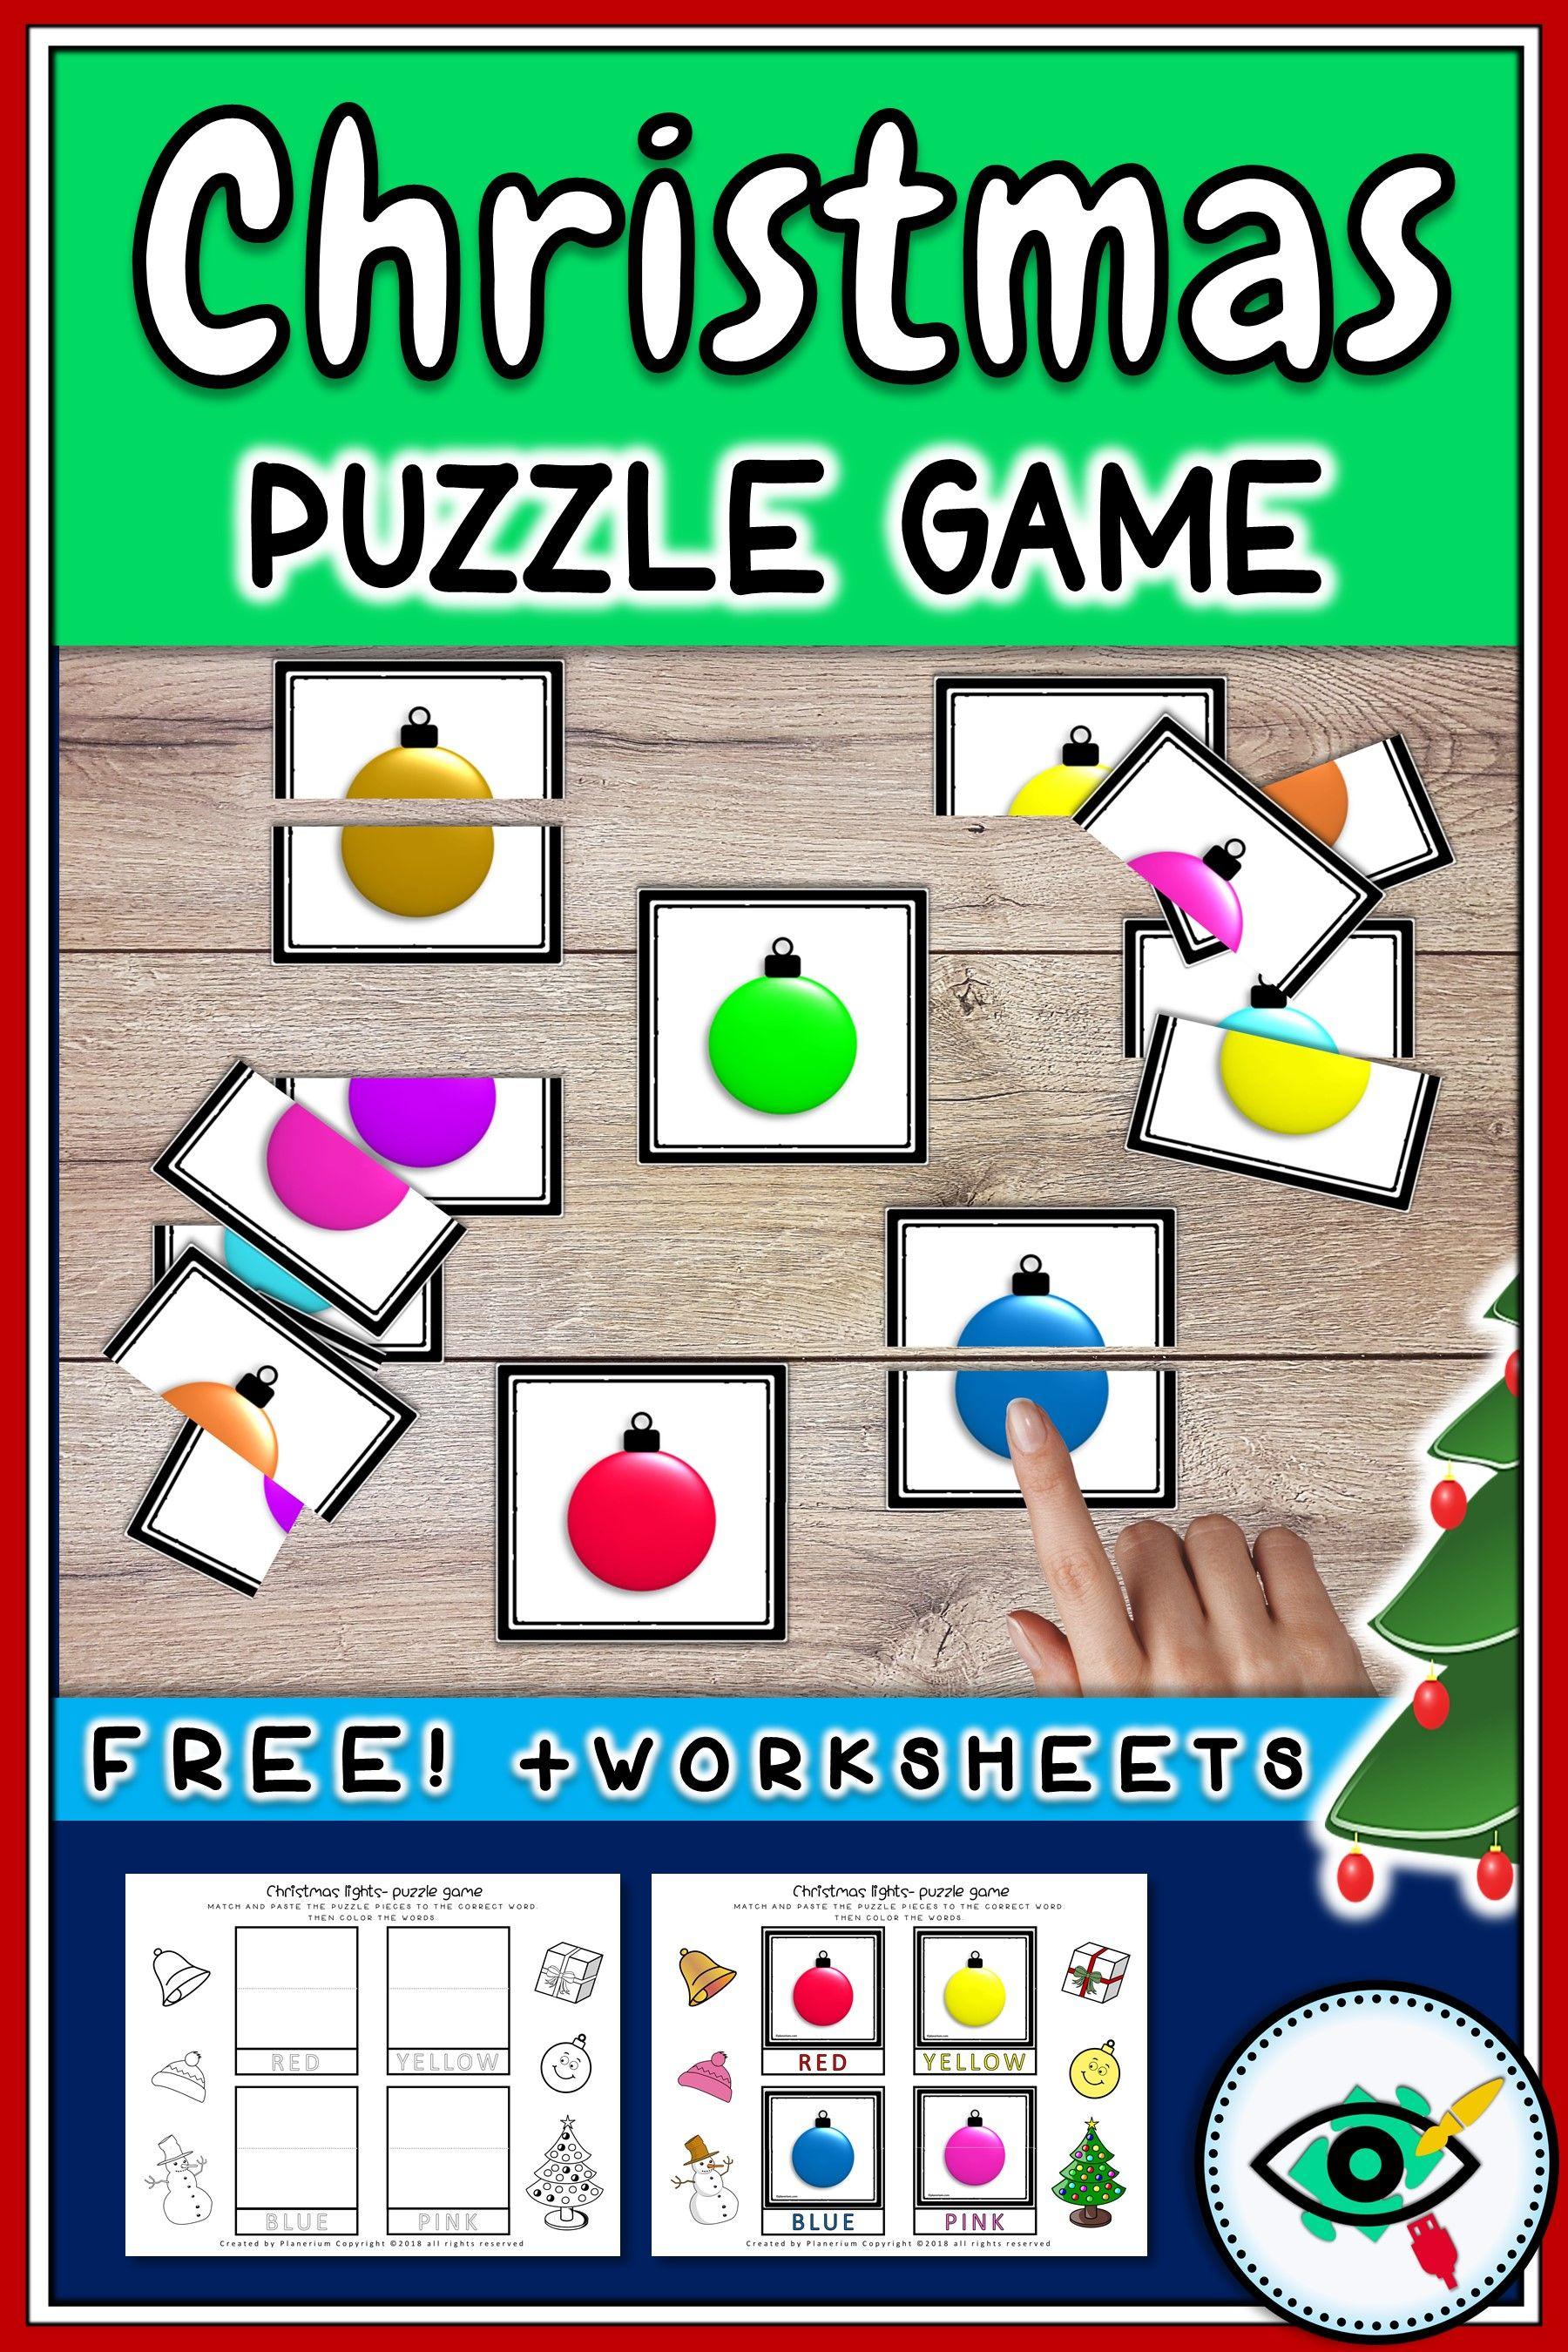 Christmas Puzzle Game Printable